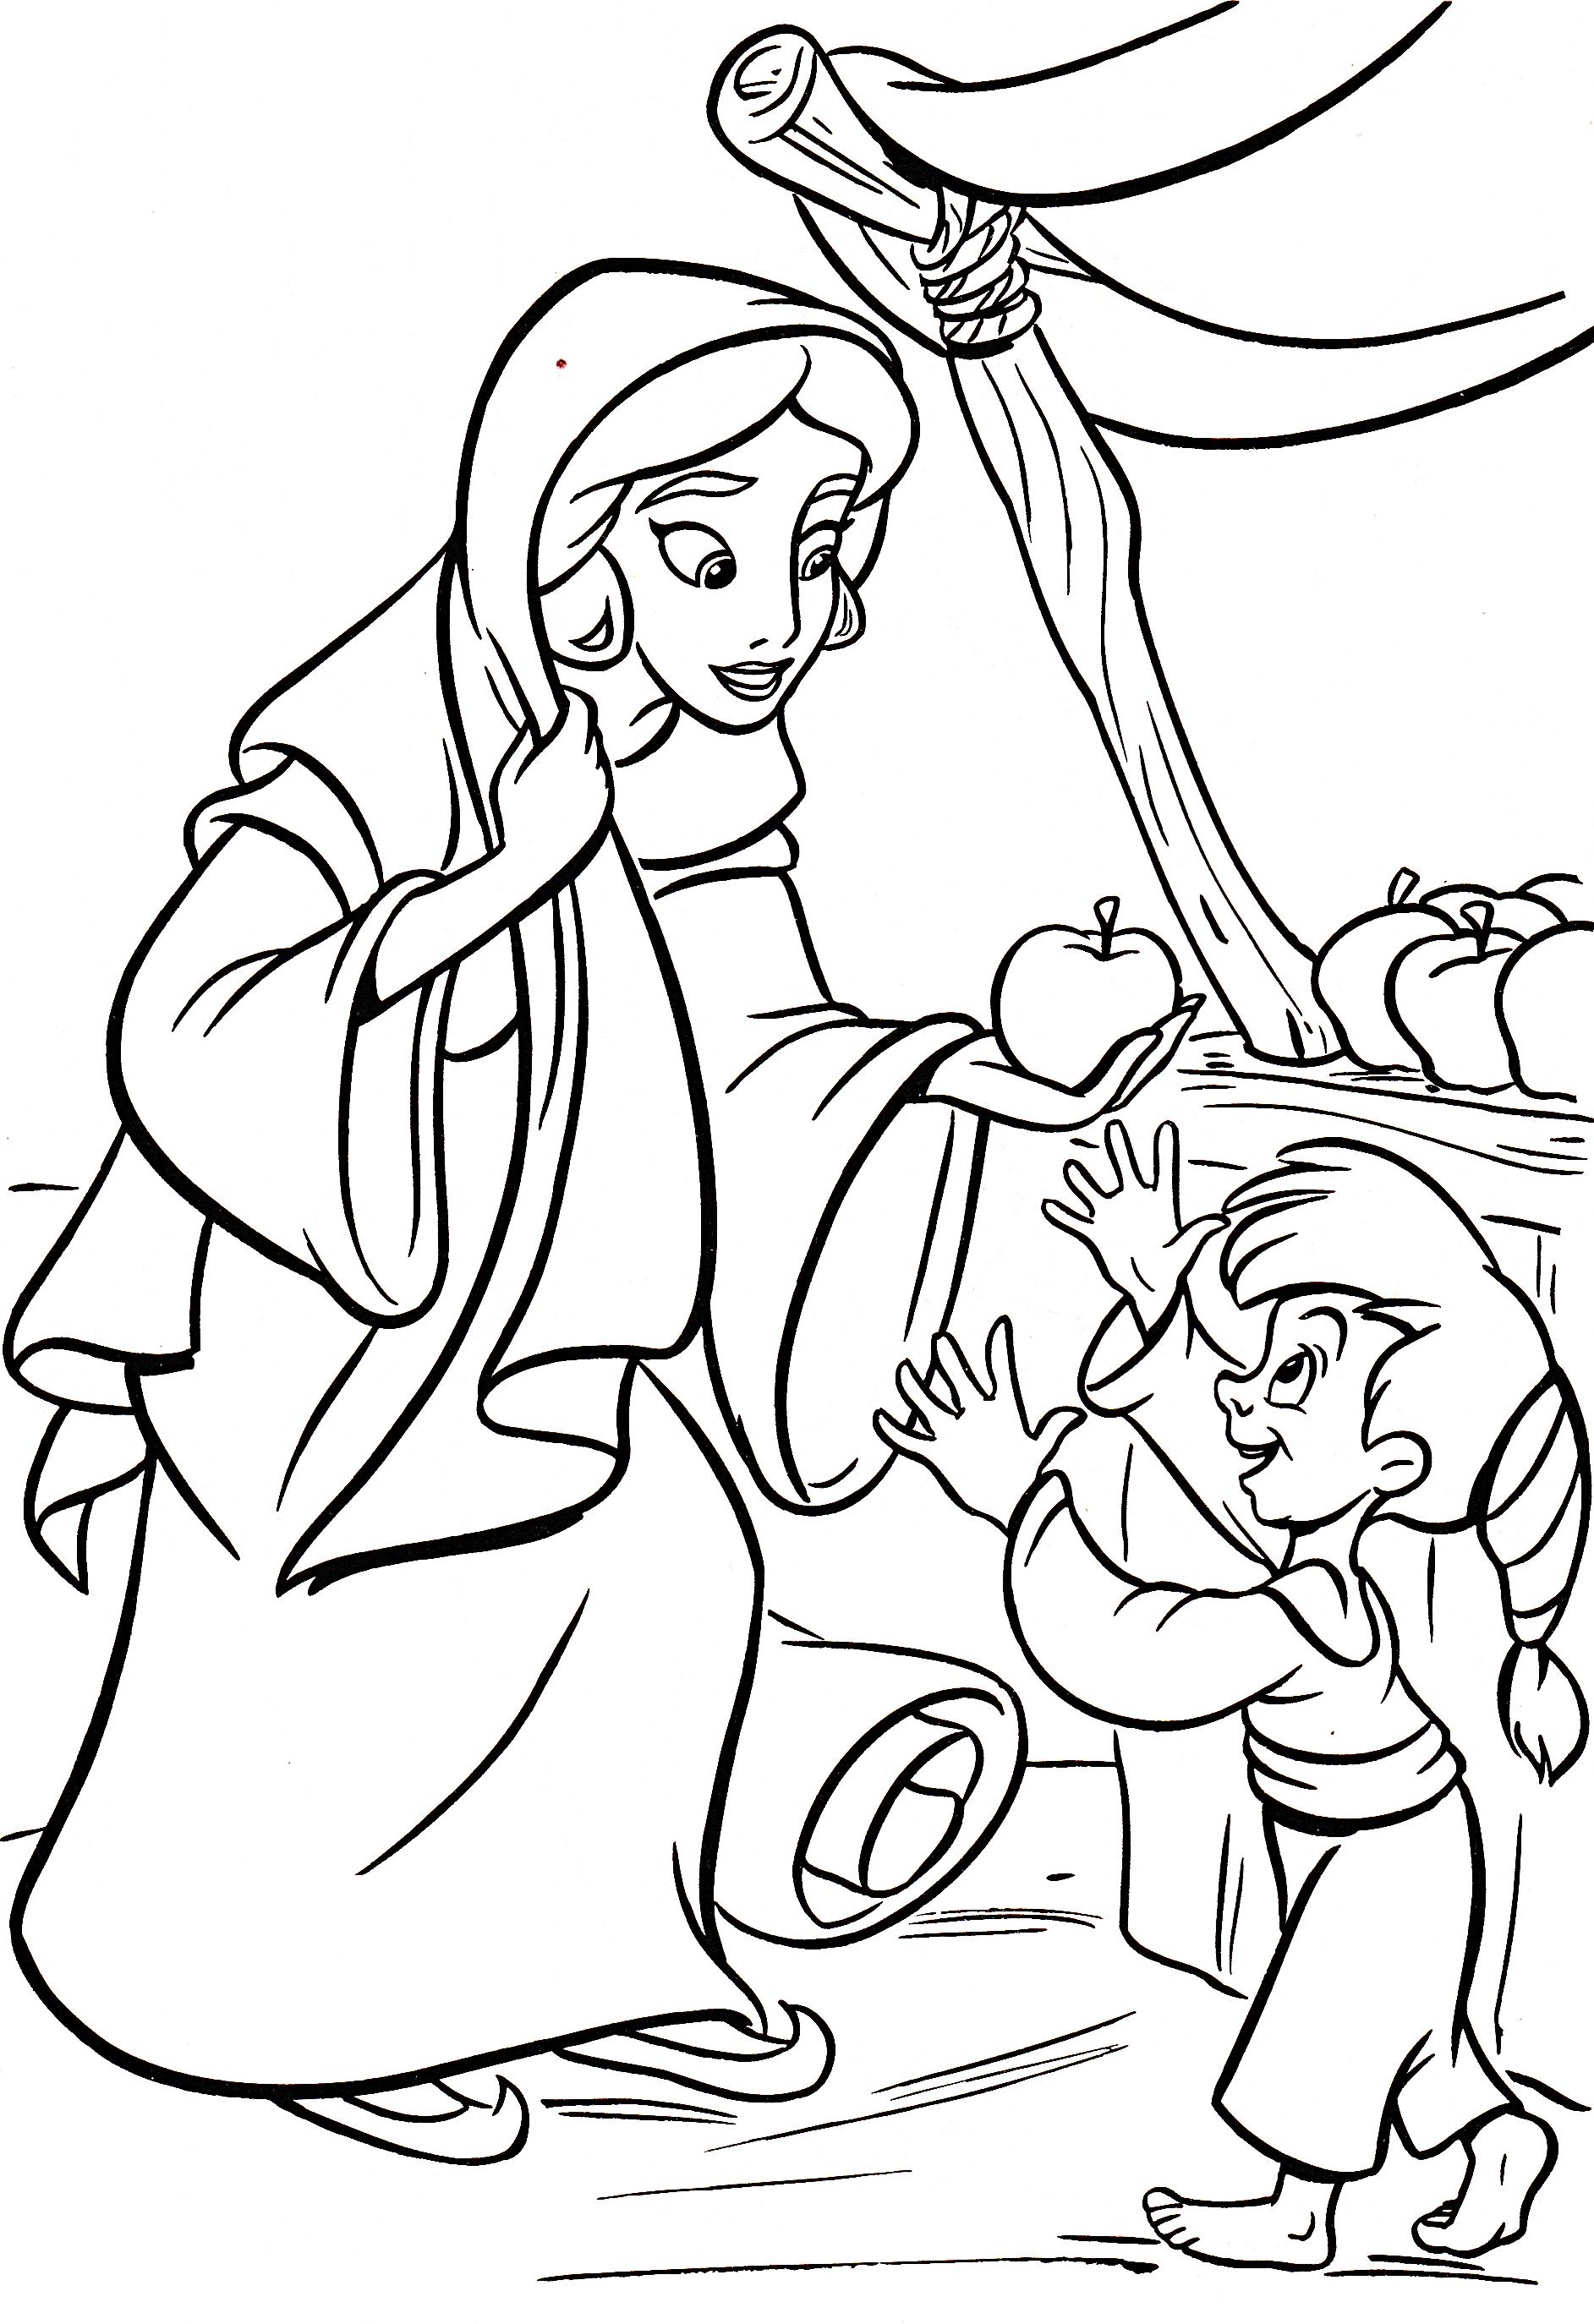 Walt Disney Coloring Pages - Princess Jasmine - Walt ...